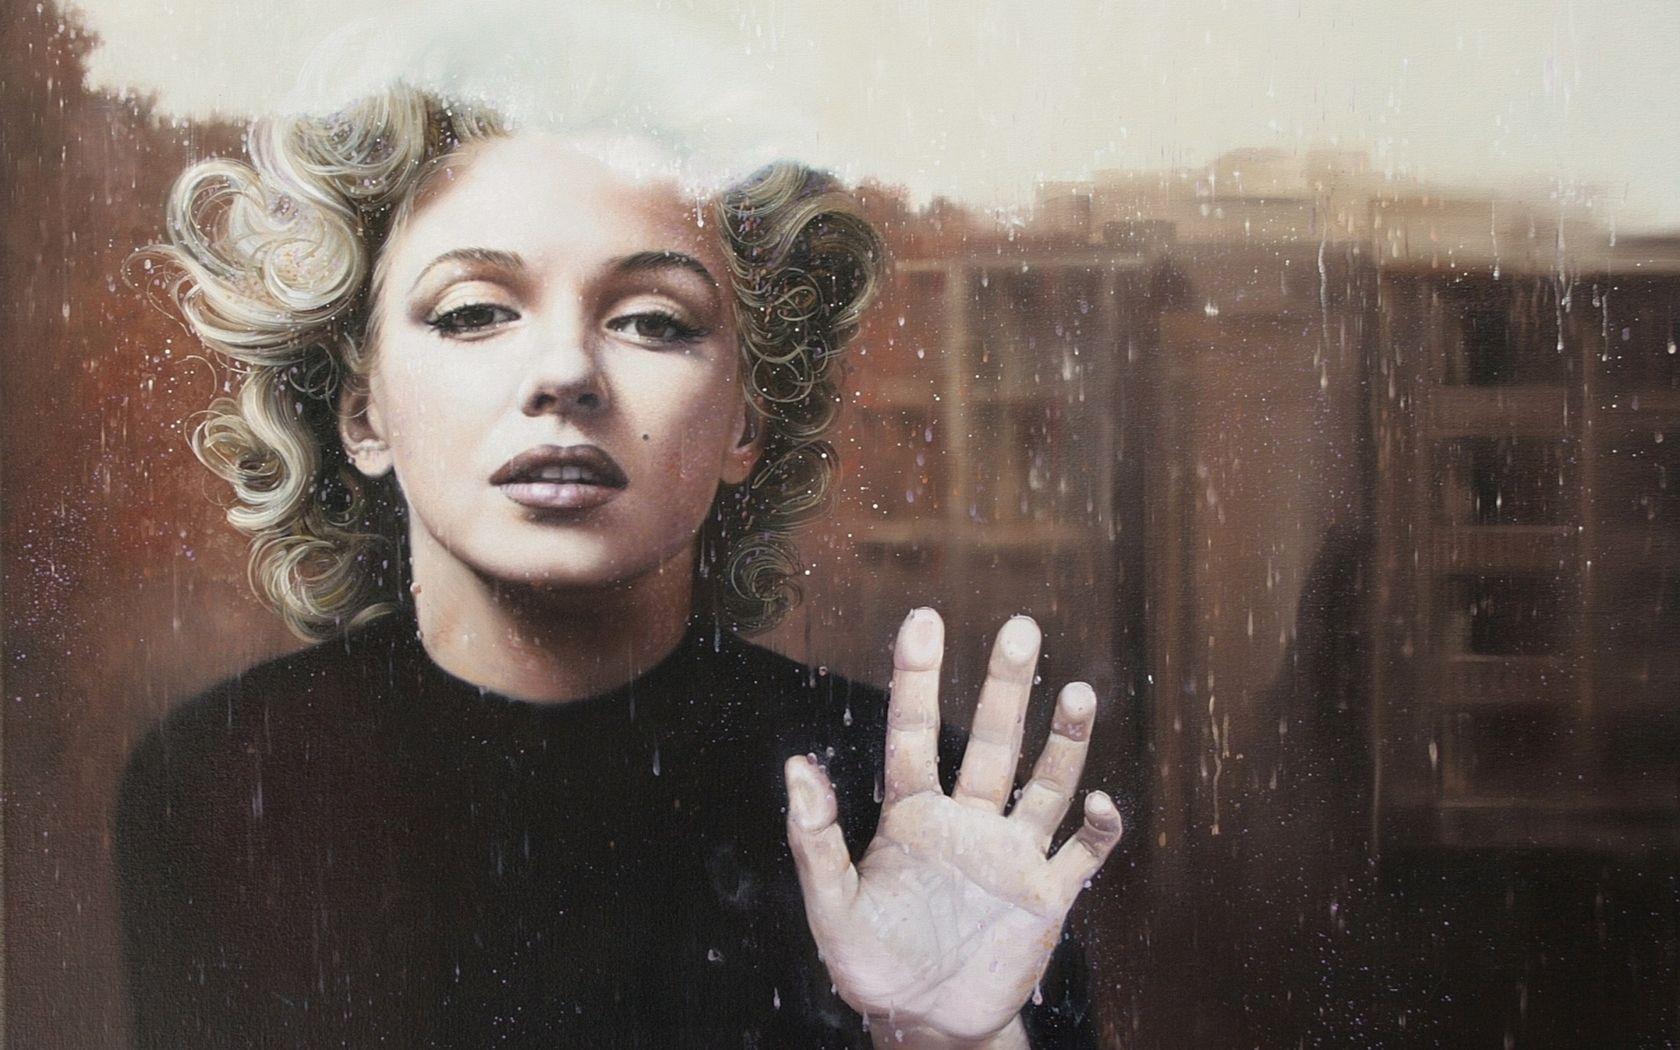 Marilyn monroe wallpapers wallpaper cave - Marilyn monroe wallpaper download ...